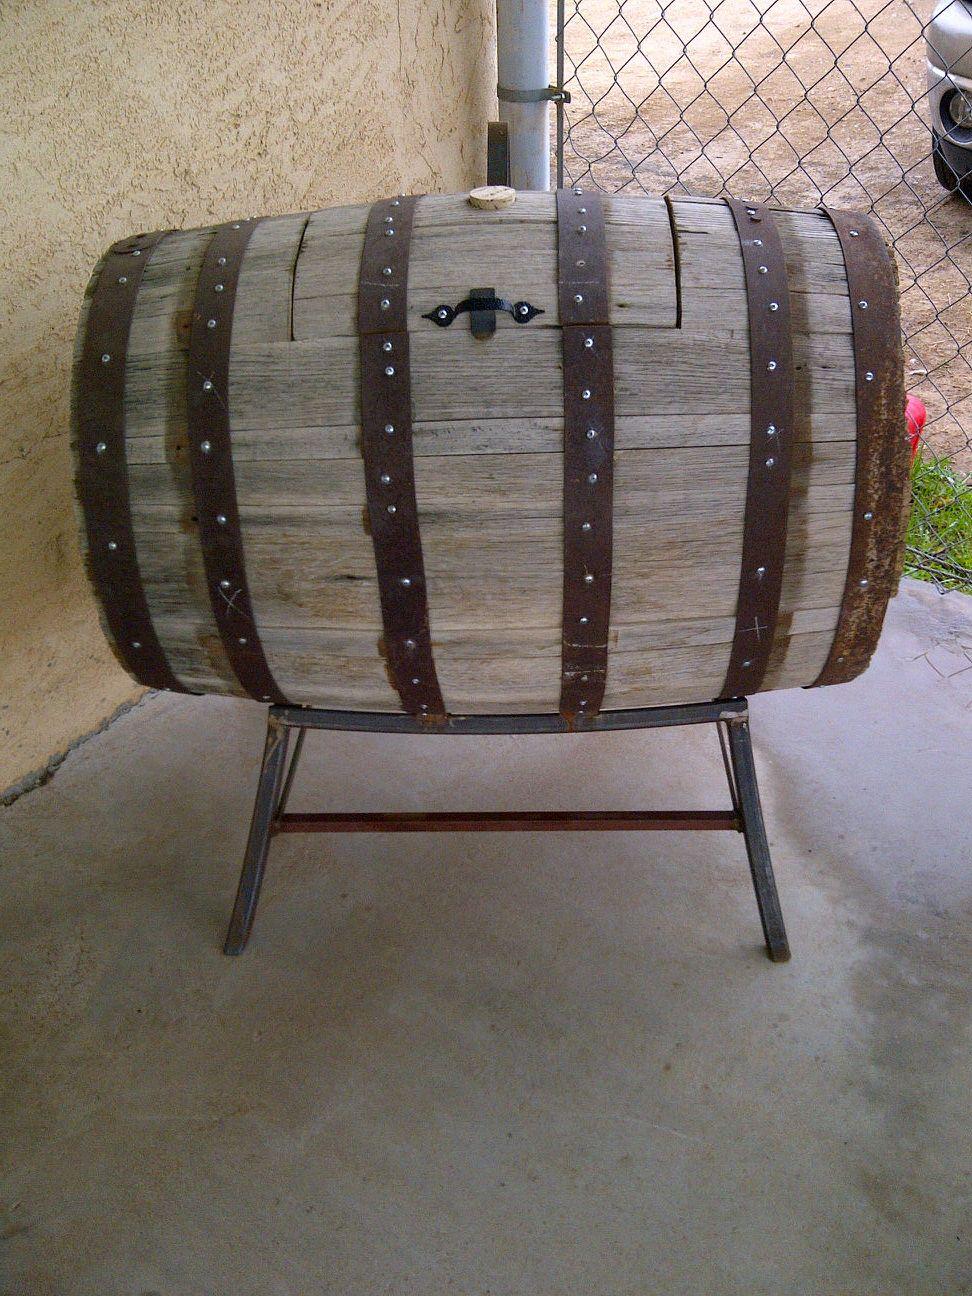 Diy Whiskey Barrel Turned Into Beverage Cooler Would